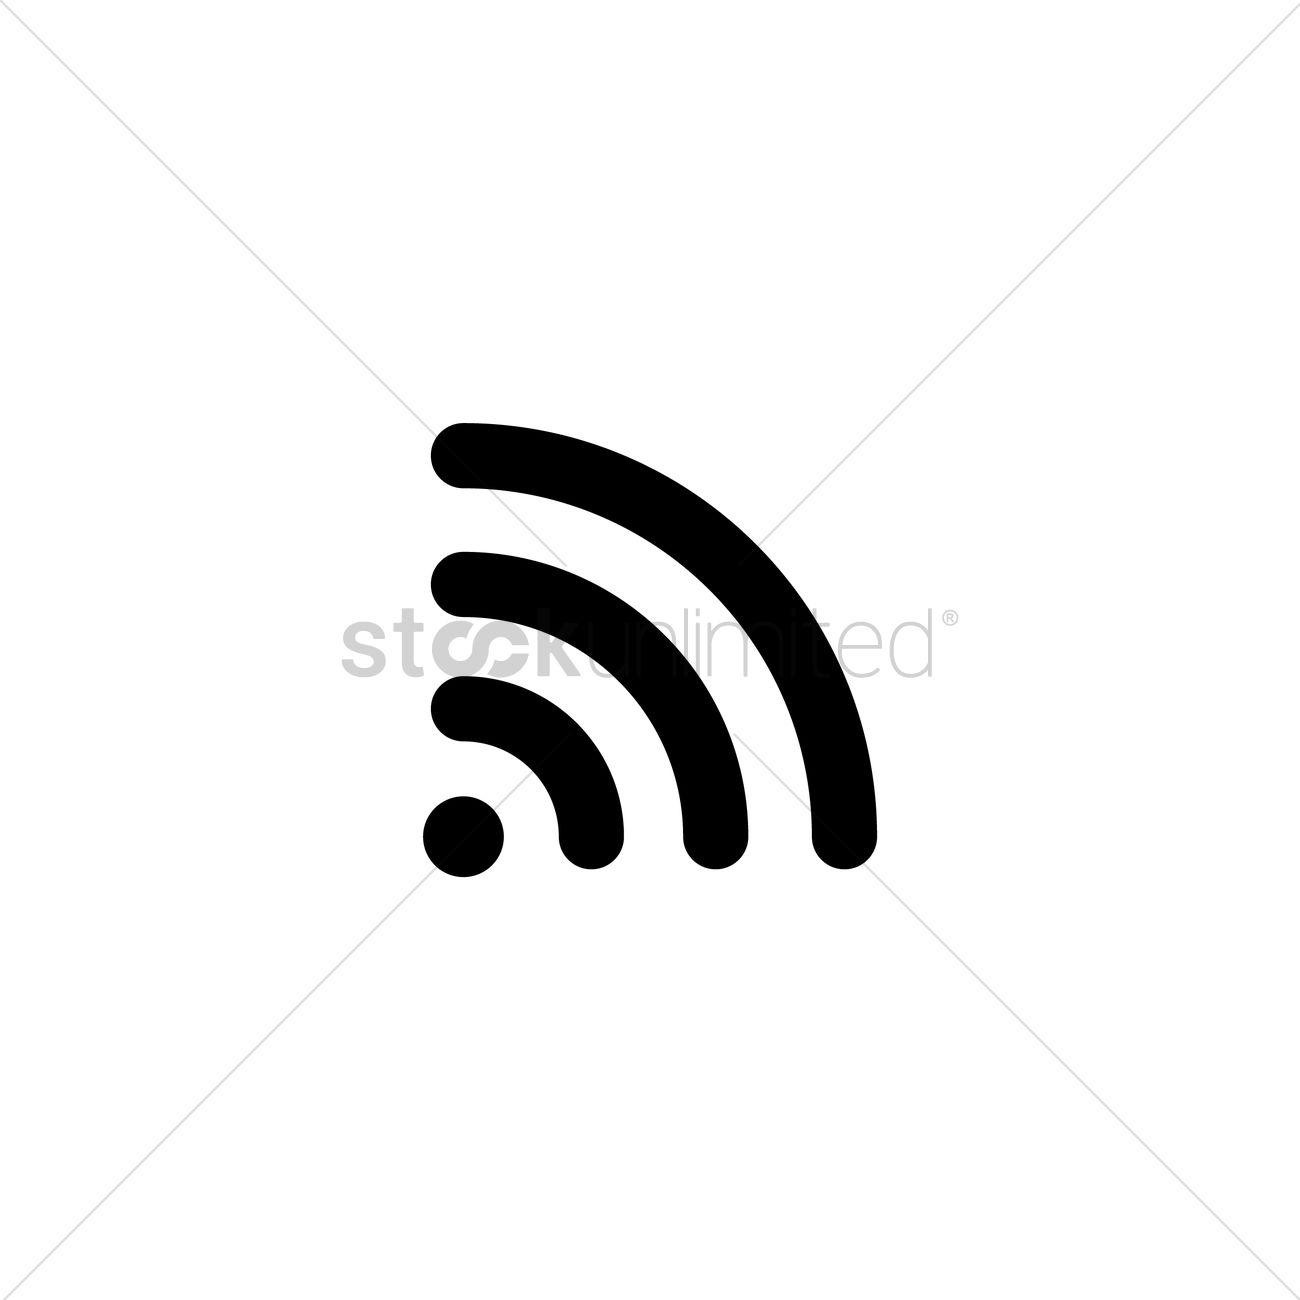 Wifi Icon Vector Image 1953024 Stockunlimited